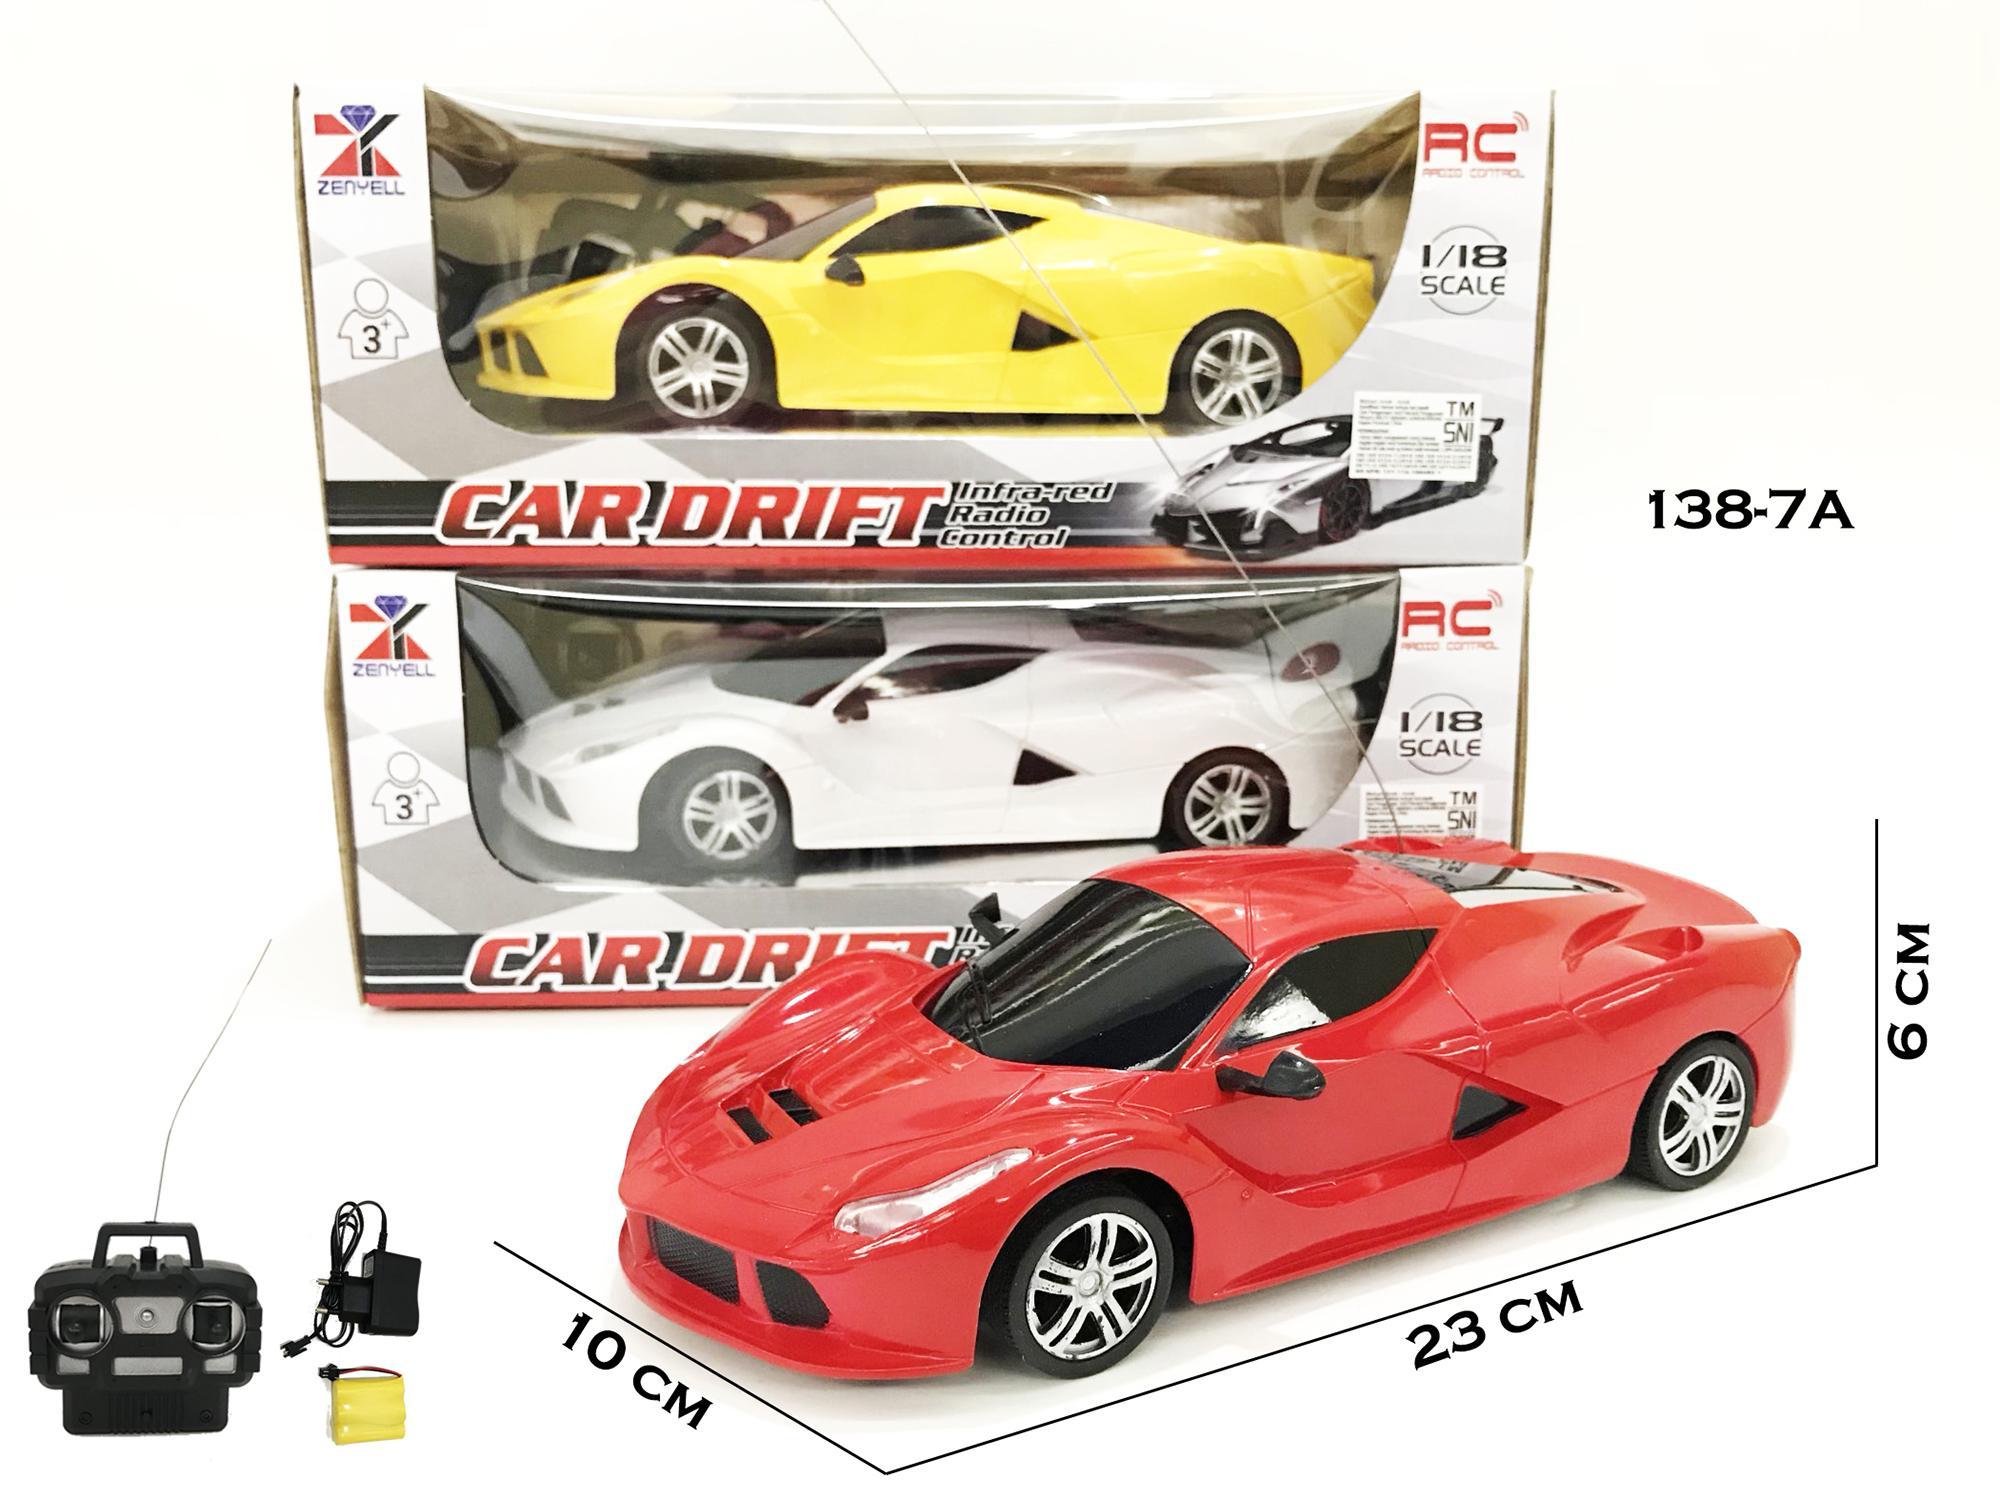 RKJ Mainan Anak RC Mobil Remot Car Drift Racing Ferrari 1:18 138-7A + FREE BATERAI A2